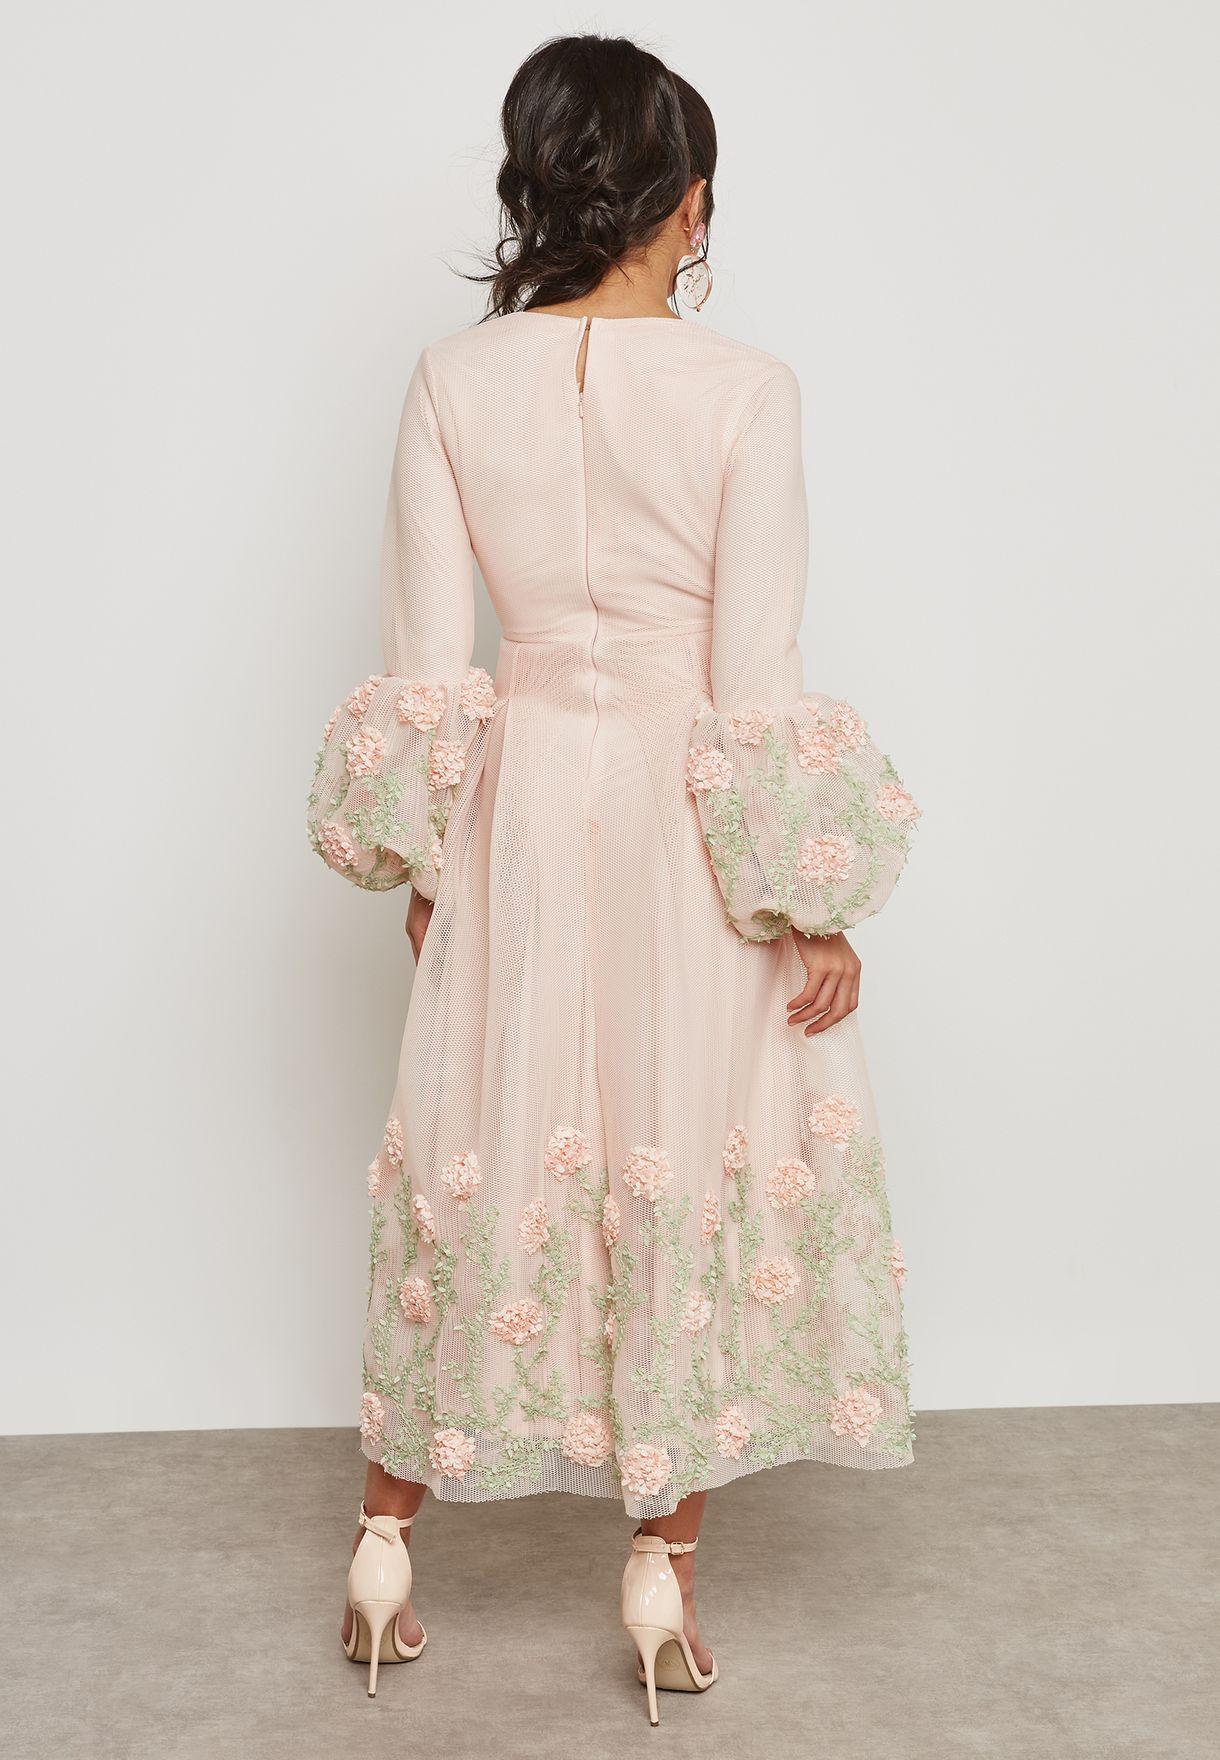 Embellished Puffed Sleeve Dress